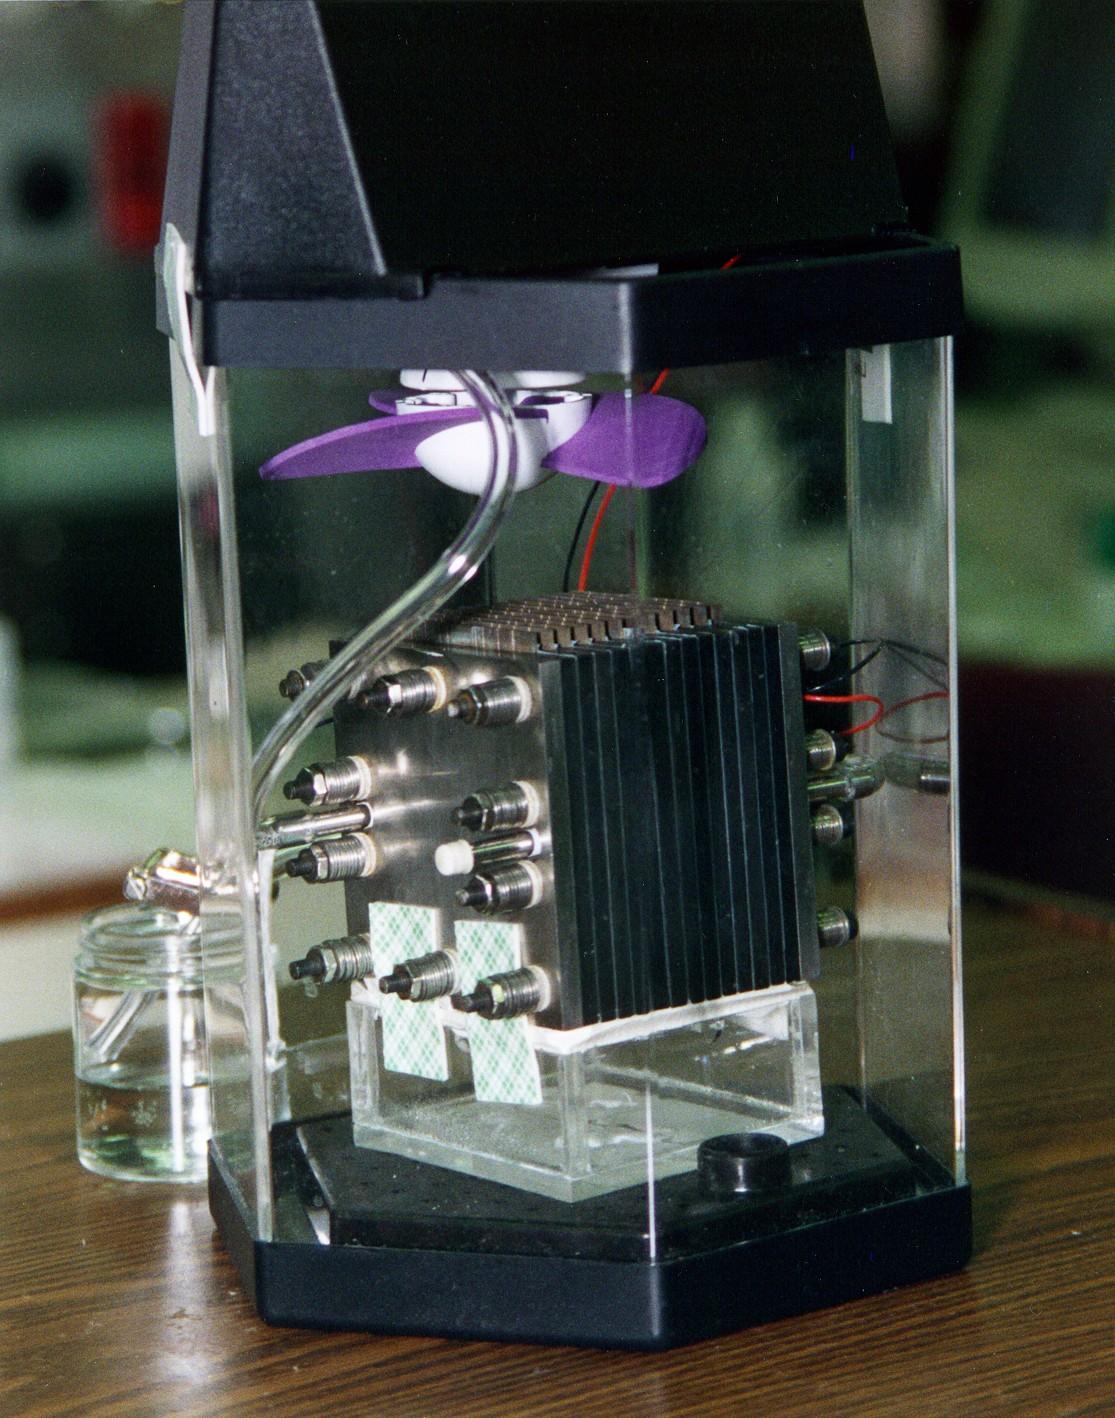 nasa fuel cells - photo #3